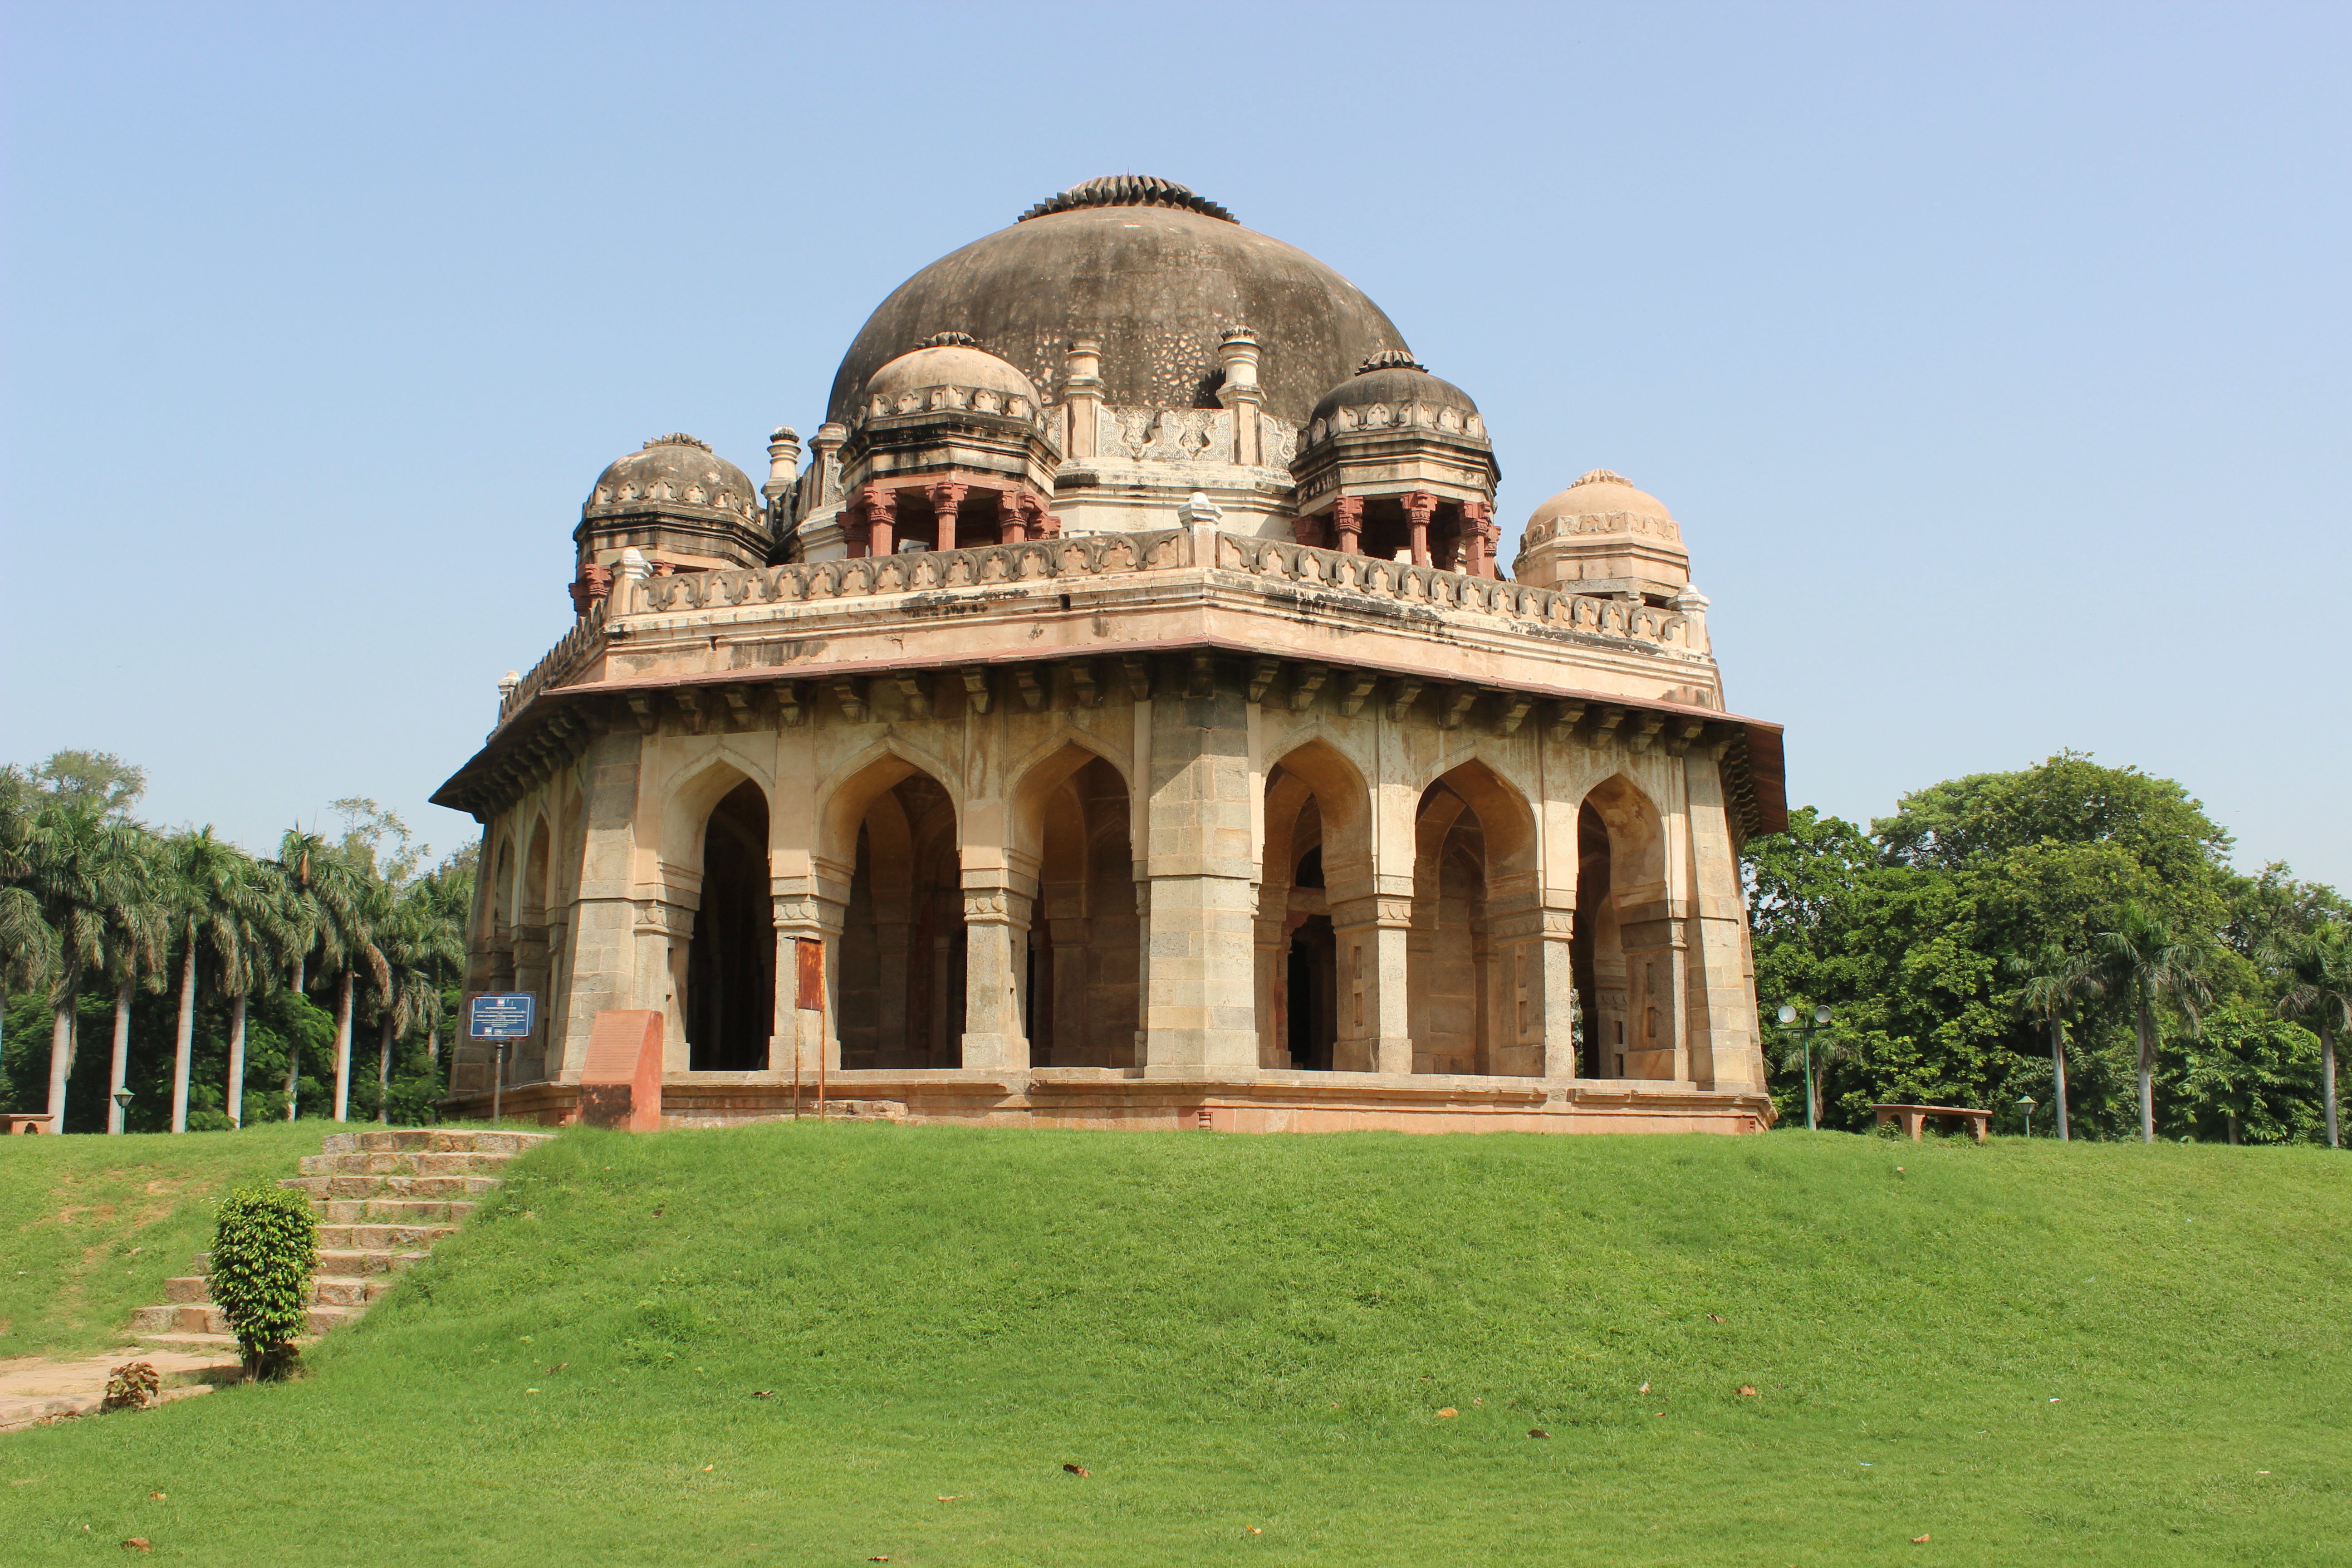 File Lodhi Garden New Delhi Photo By Anita Mishra Jpg